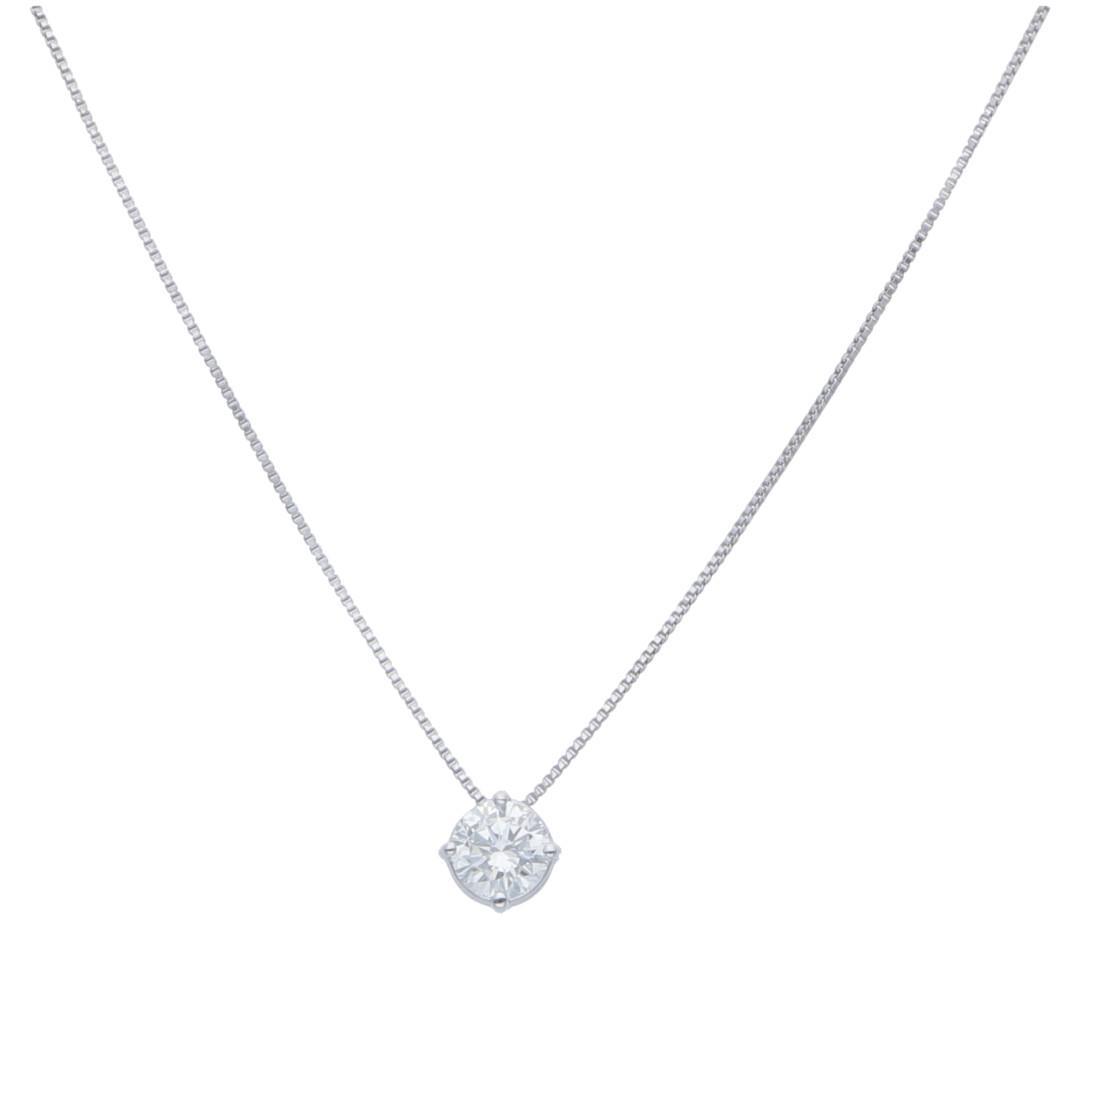 Collana punto luce con diamanti ct 0,47 - ALFIERI & ST. JOHN